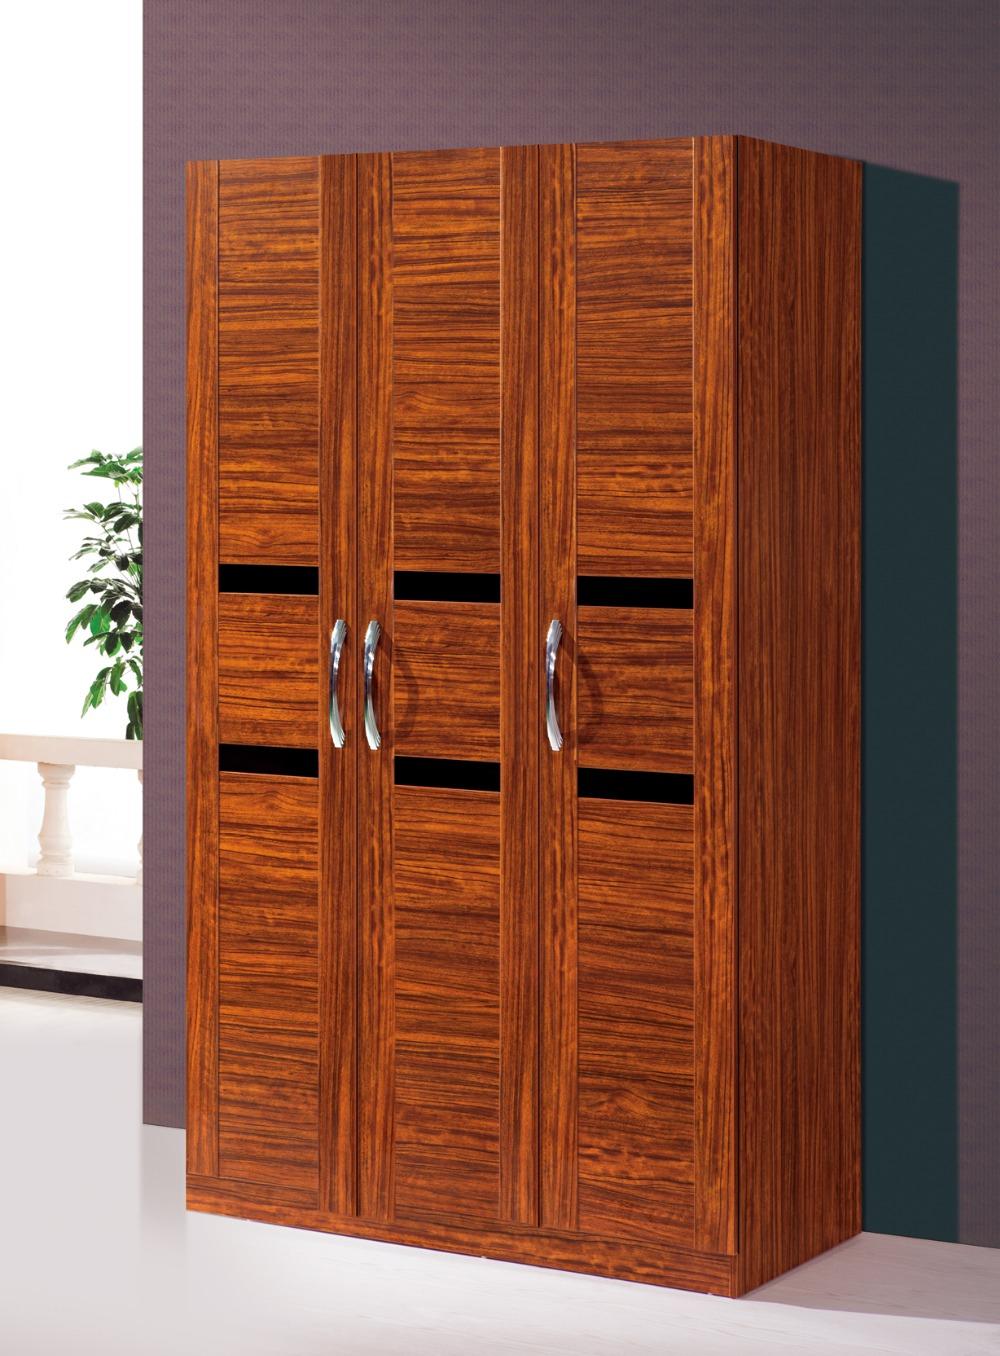 2 3 4 5 6 Doors New Cabinet Wardrobe Storage Cabinet Tissue In 31 5 82 7 Wood Bedroom